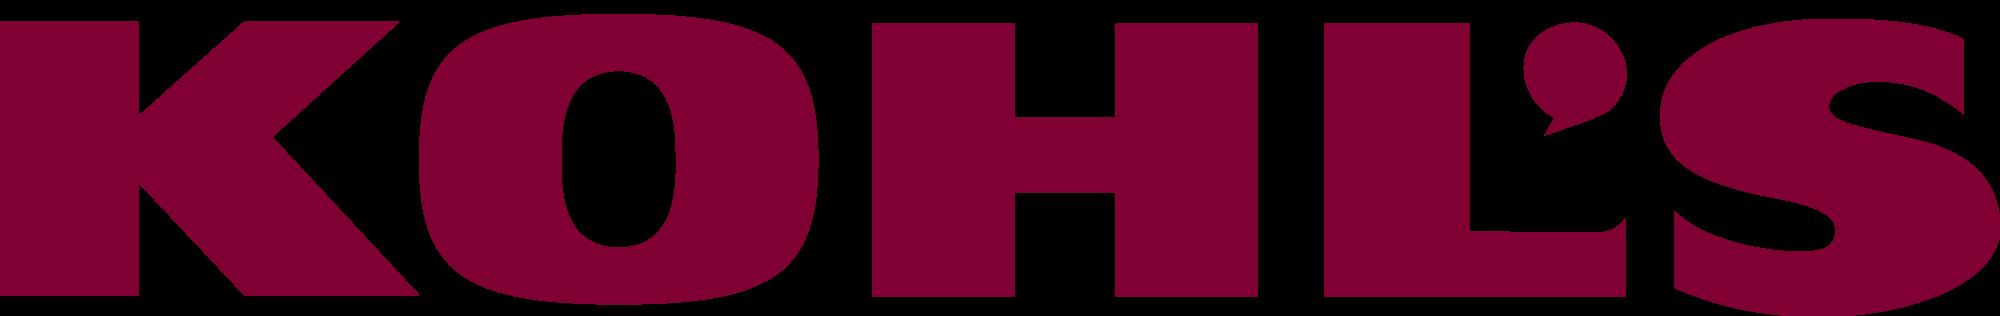 Kohls Logo Images - Reverse Search